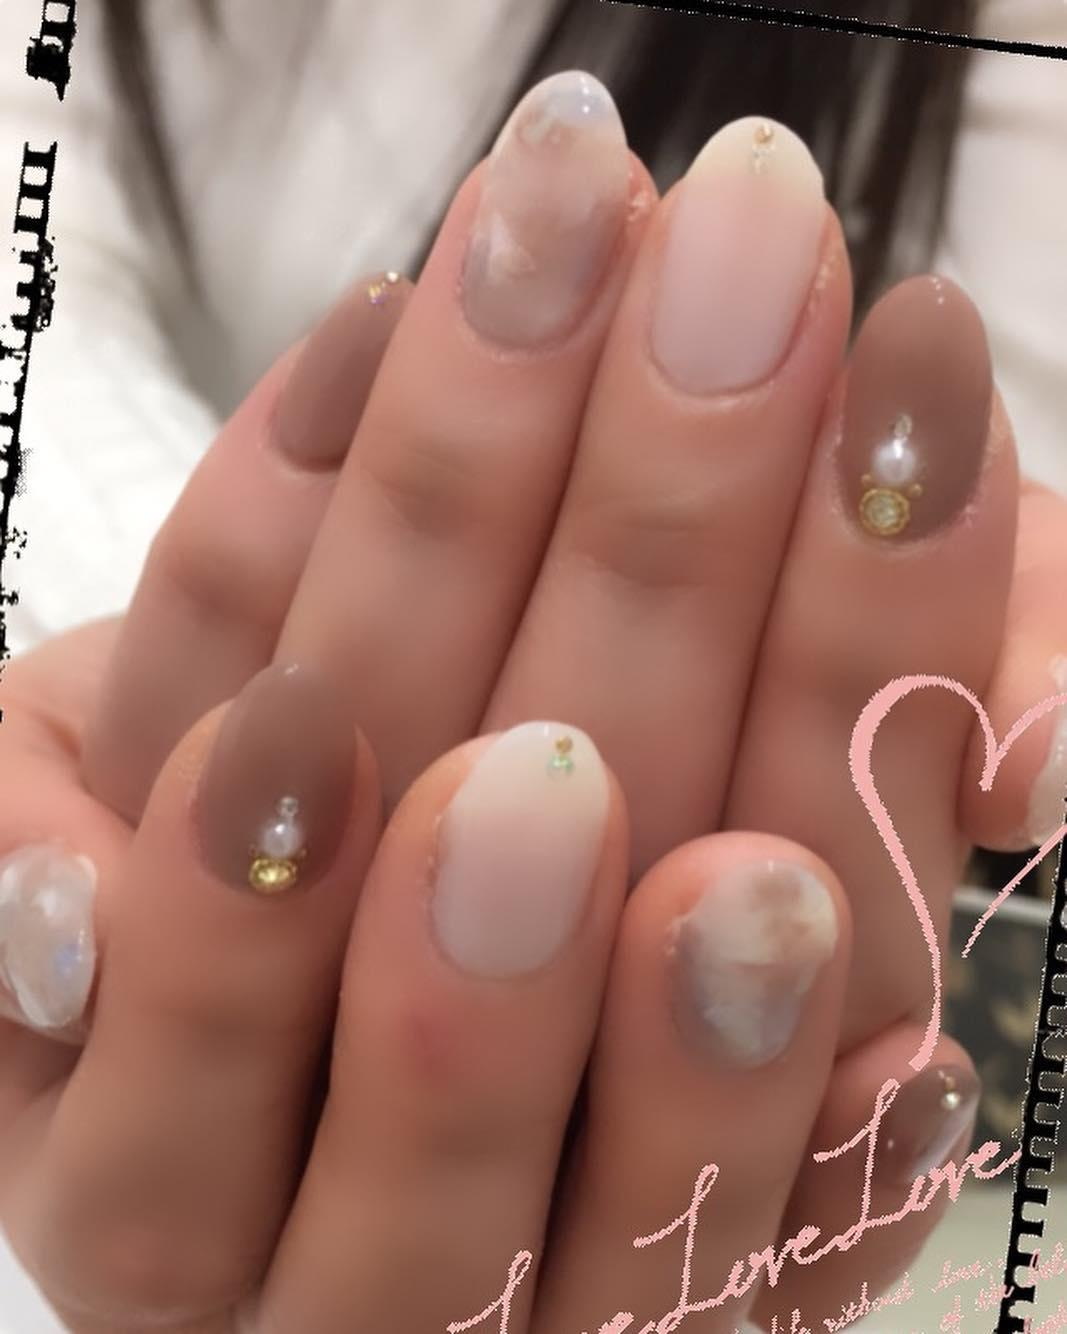 simple flower nail design ideas 2019 10 - 24 Simple Flower Nail Design Ideas 2019